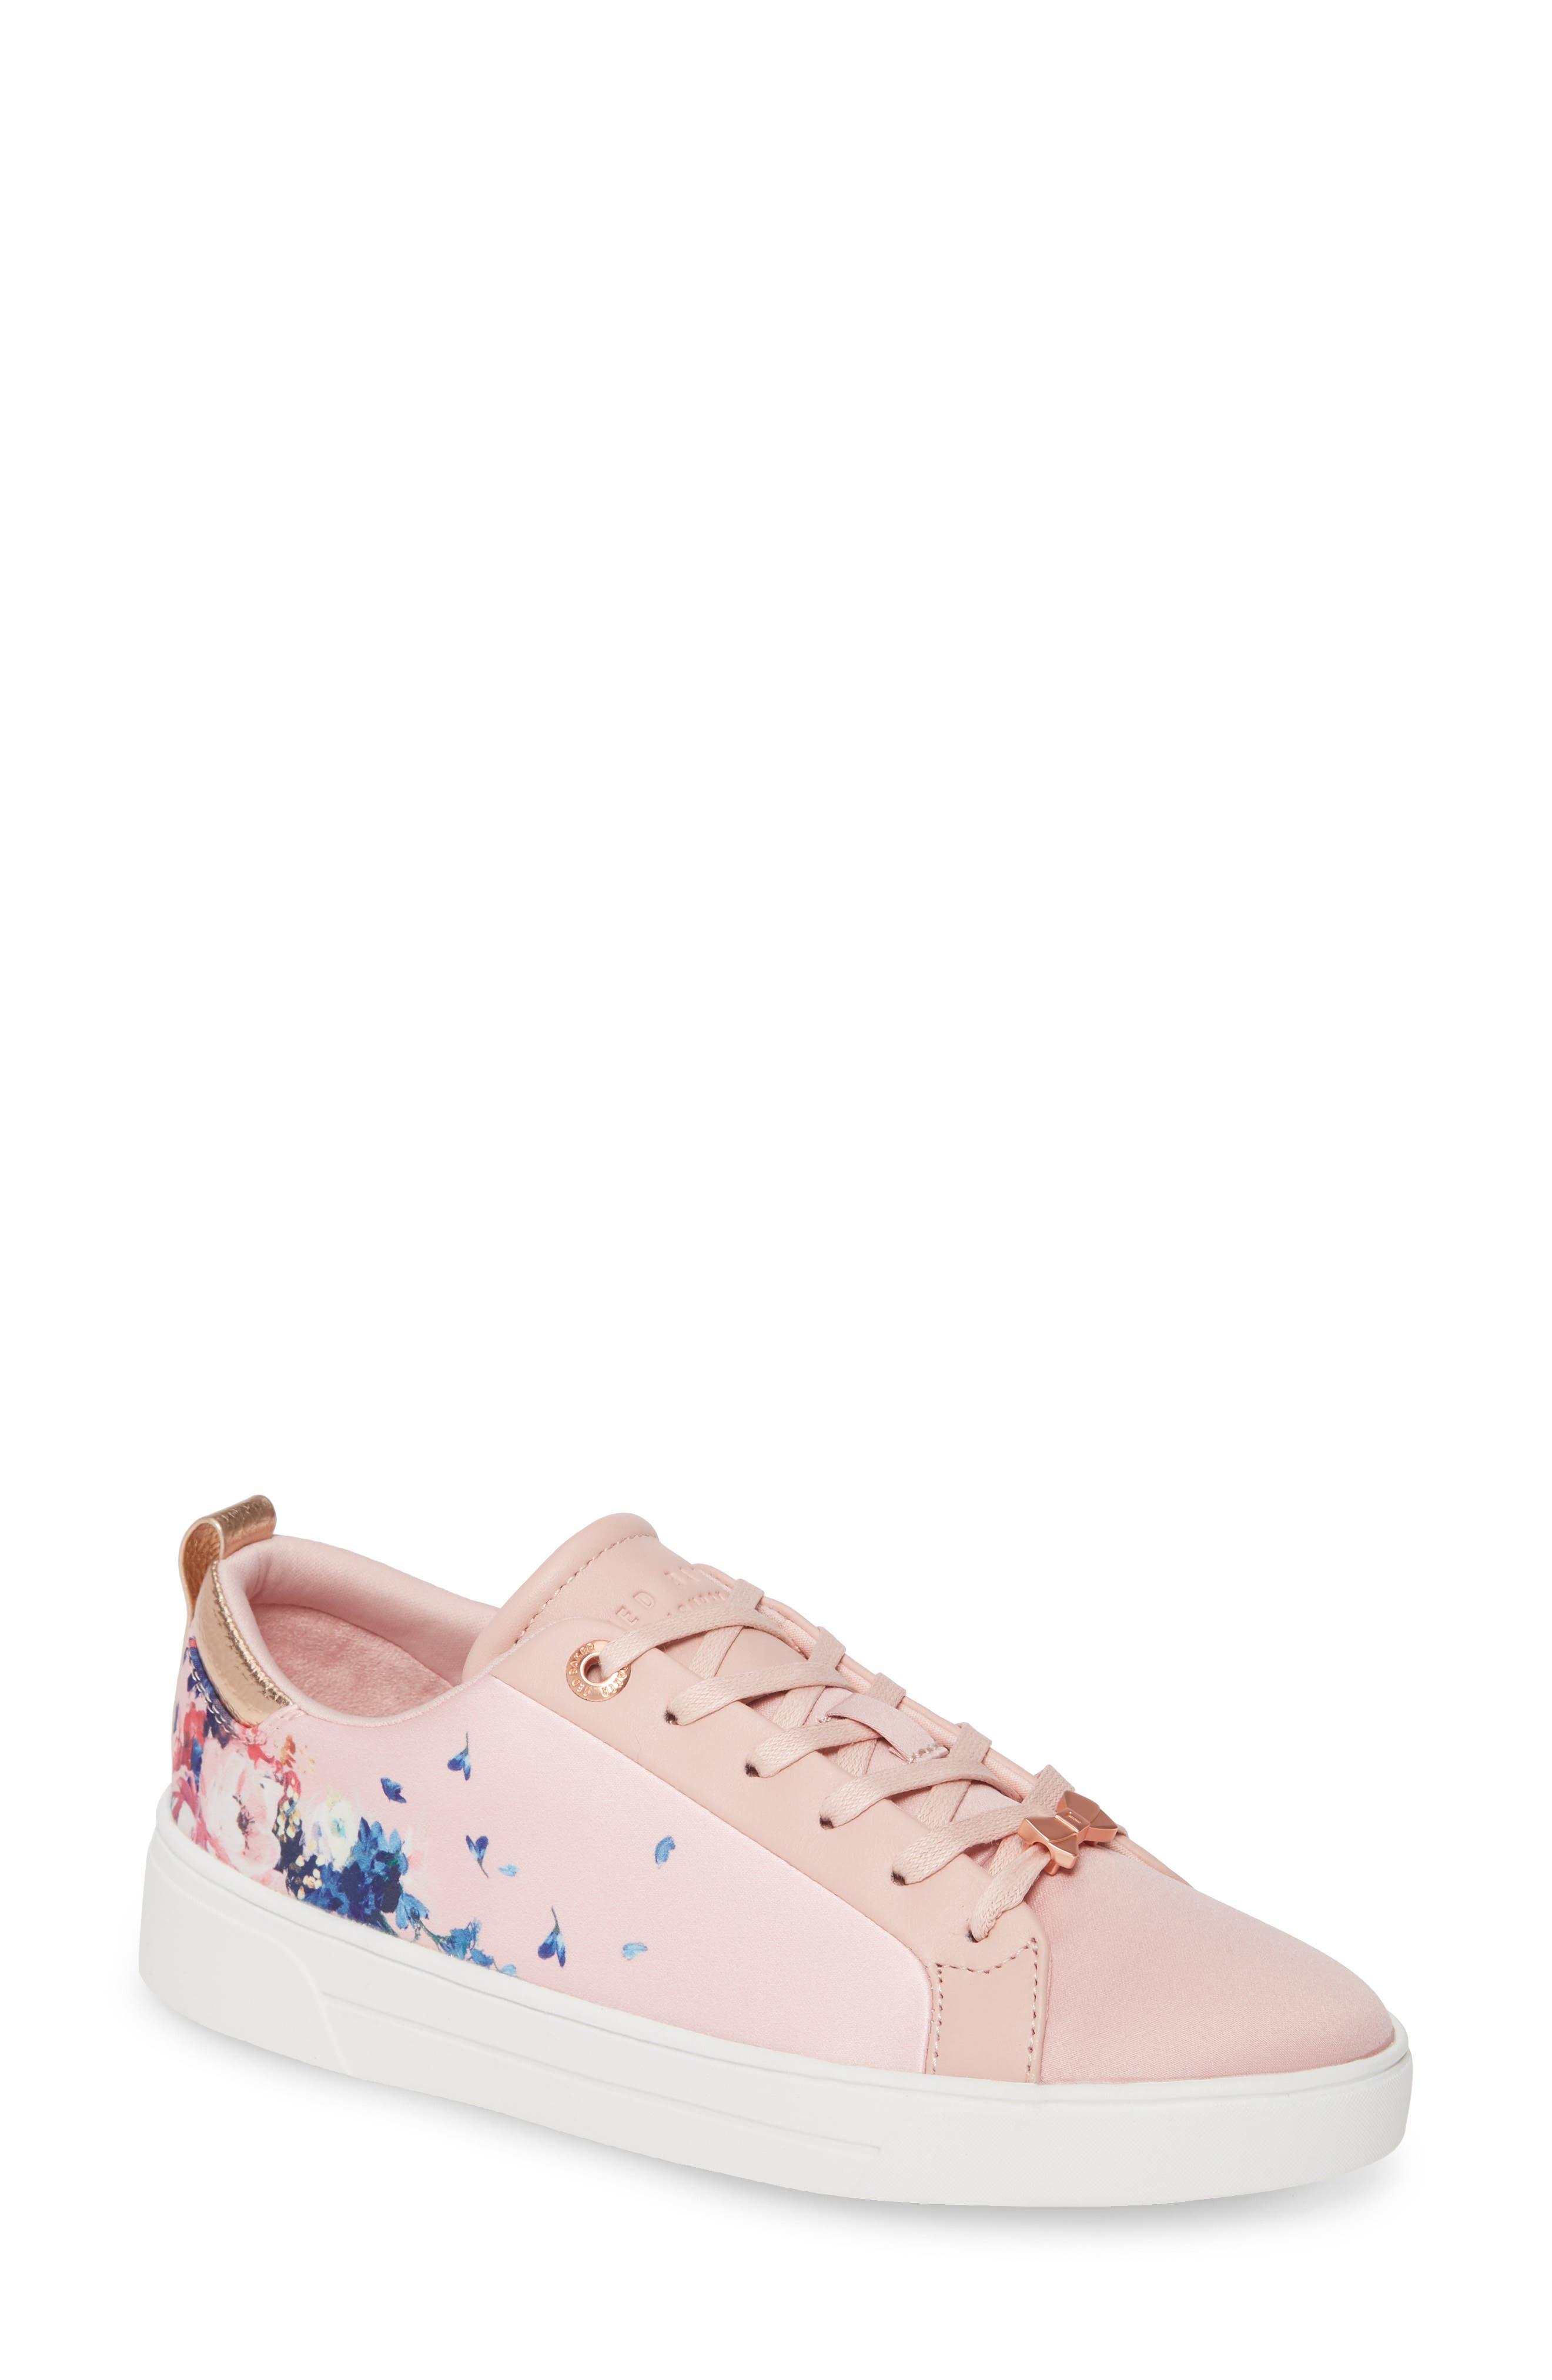 Ted Baker London Jymina Sneaker- Pink